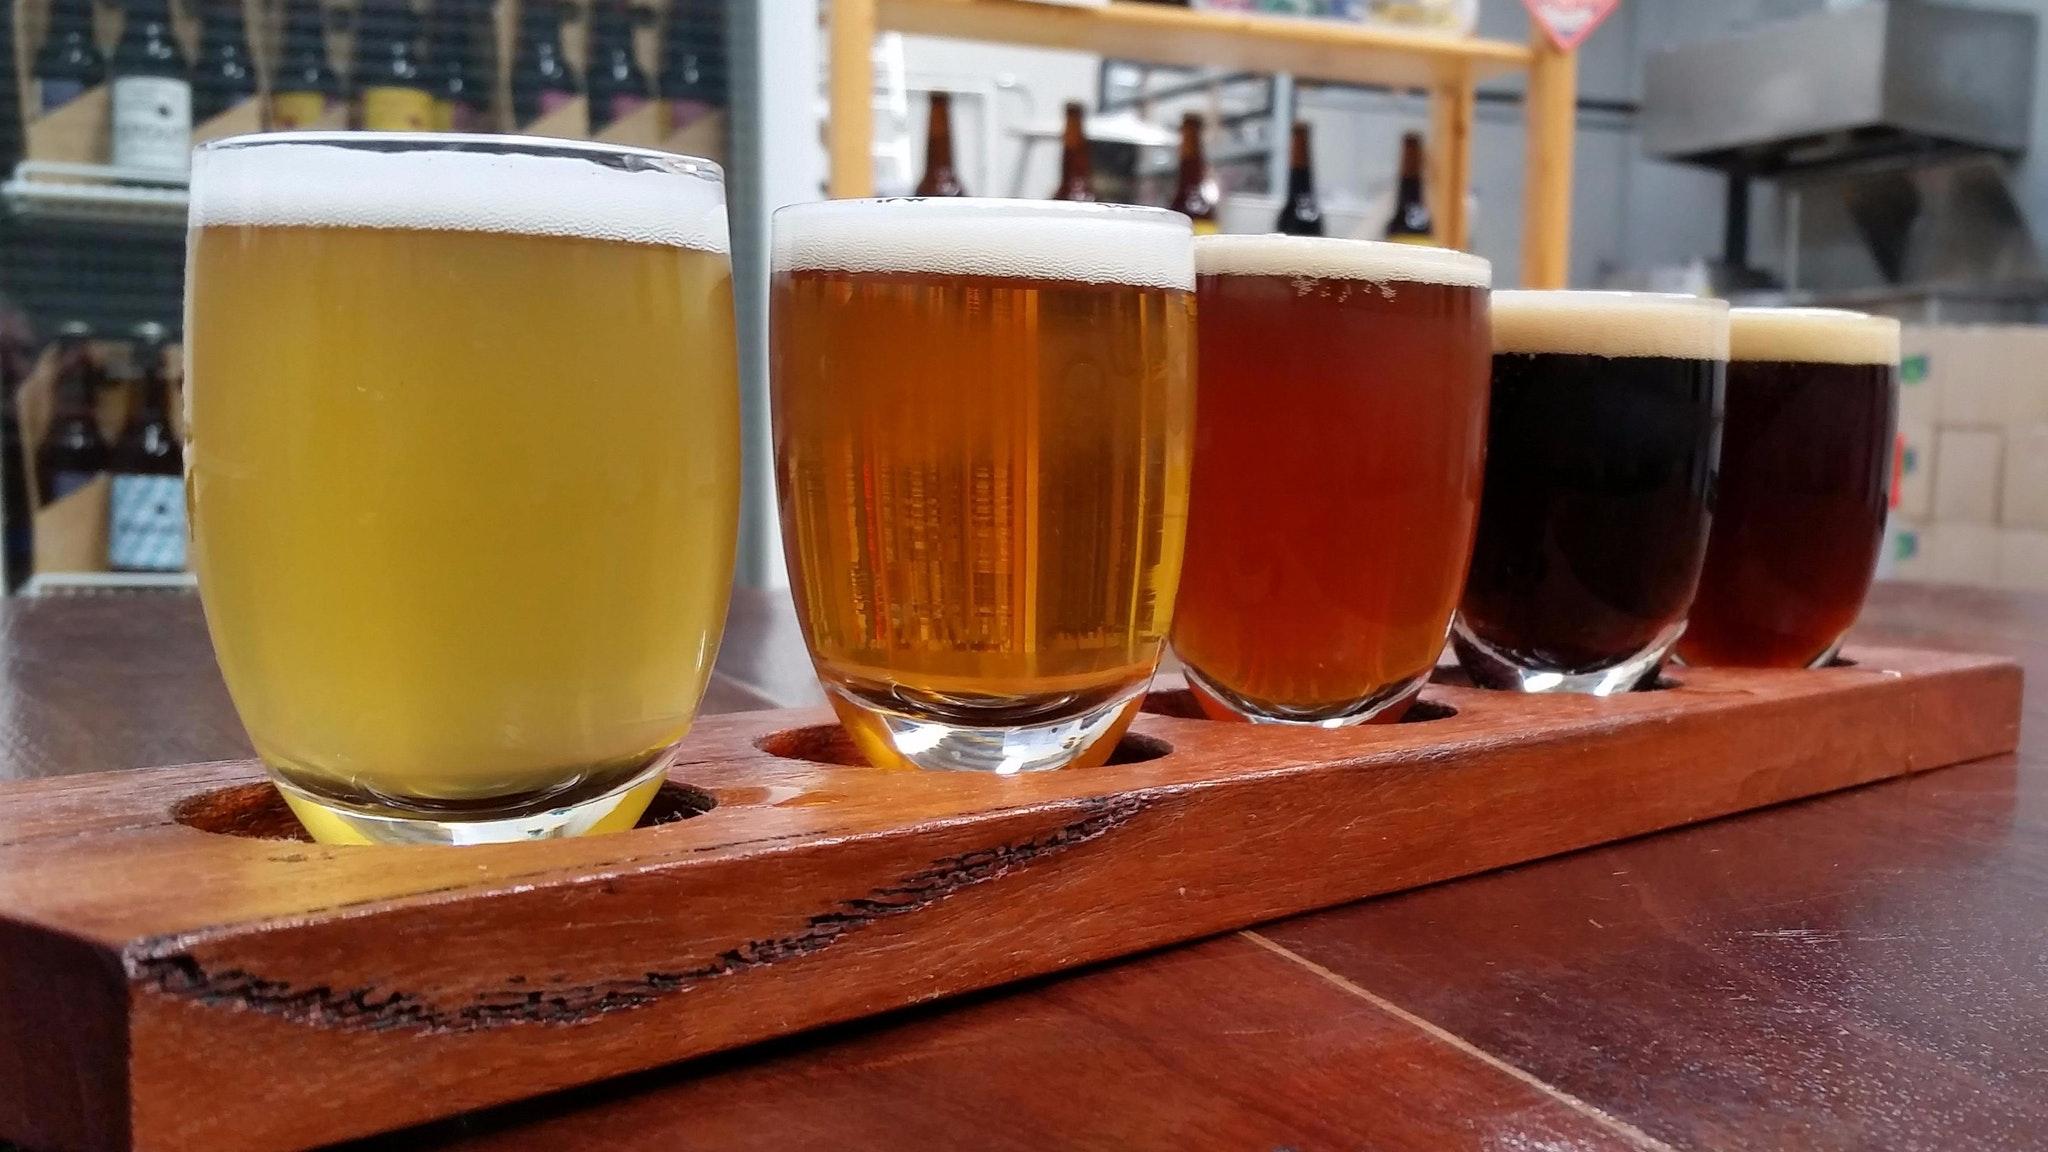 A five beer tasting paddle